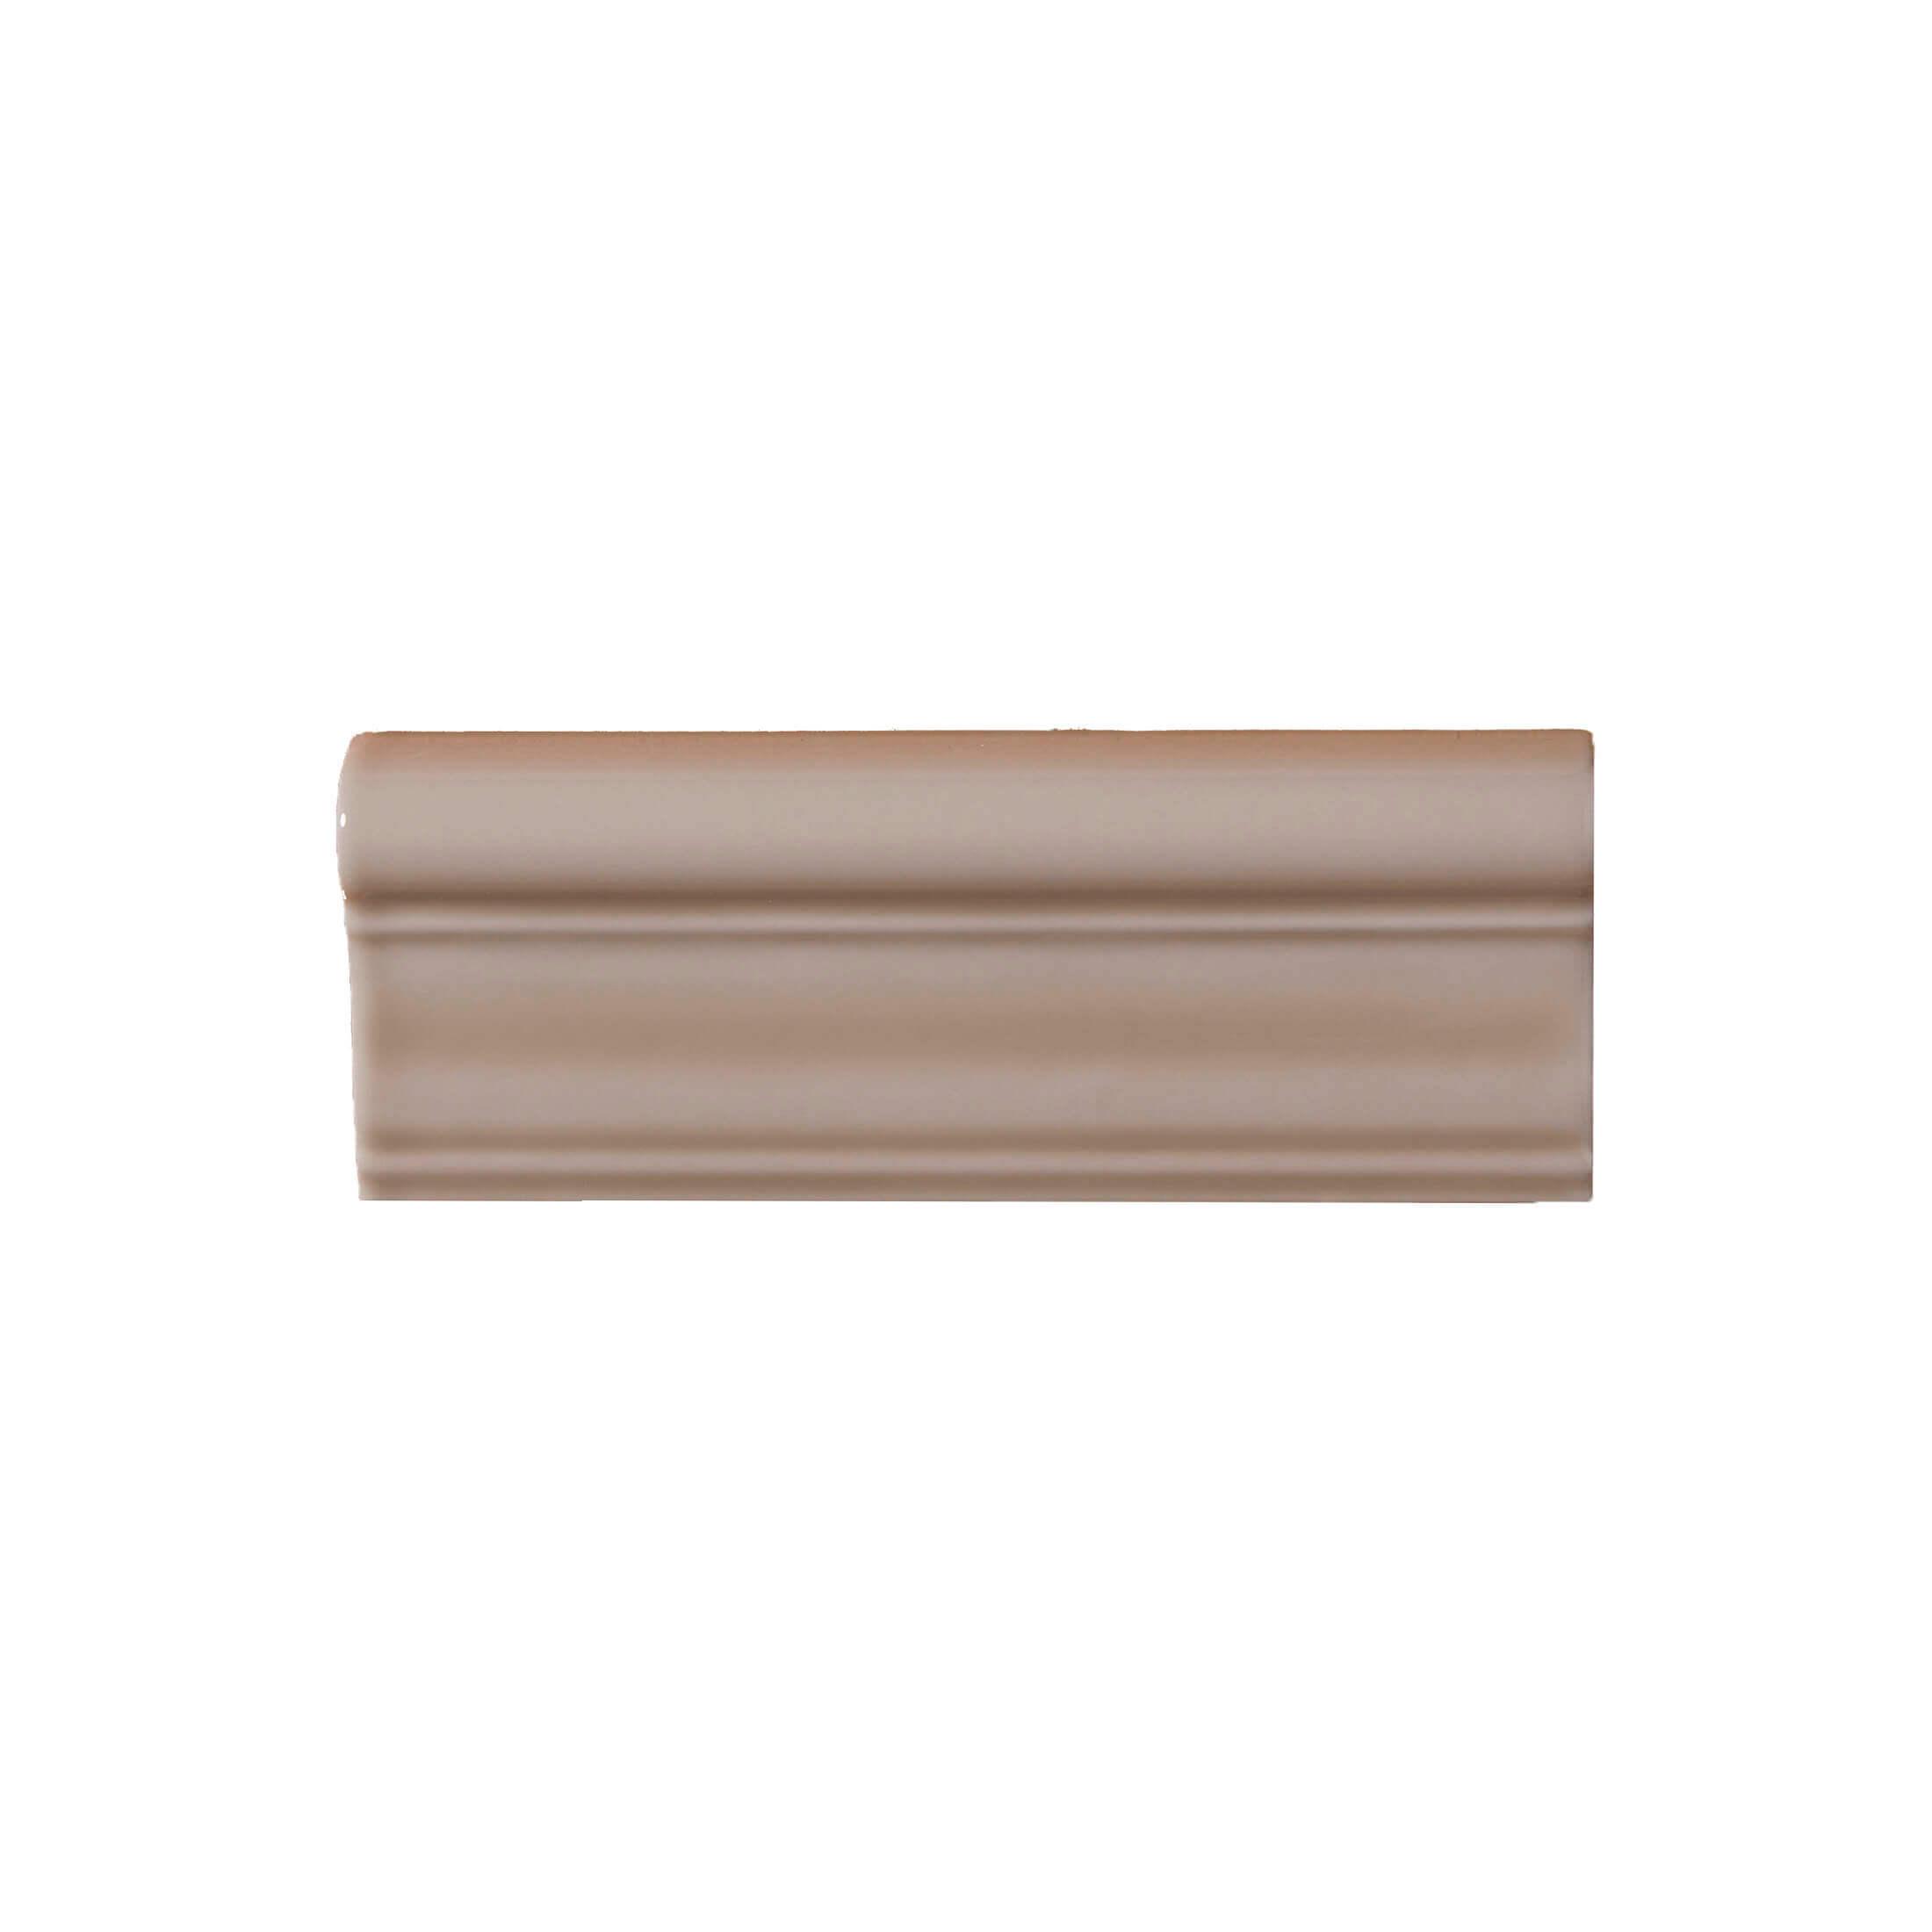 ADST5093 - CORNISA  - 7.5 cm X 19.8 cm